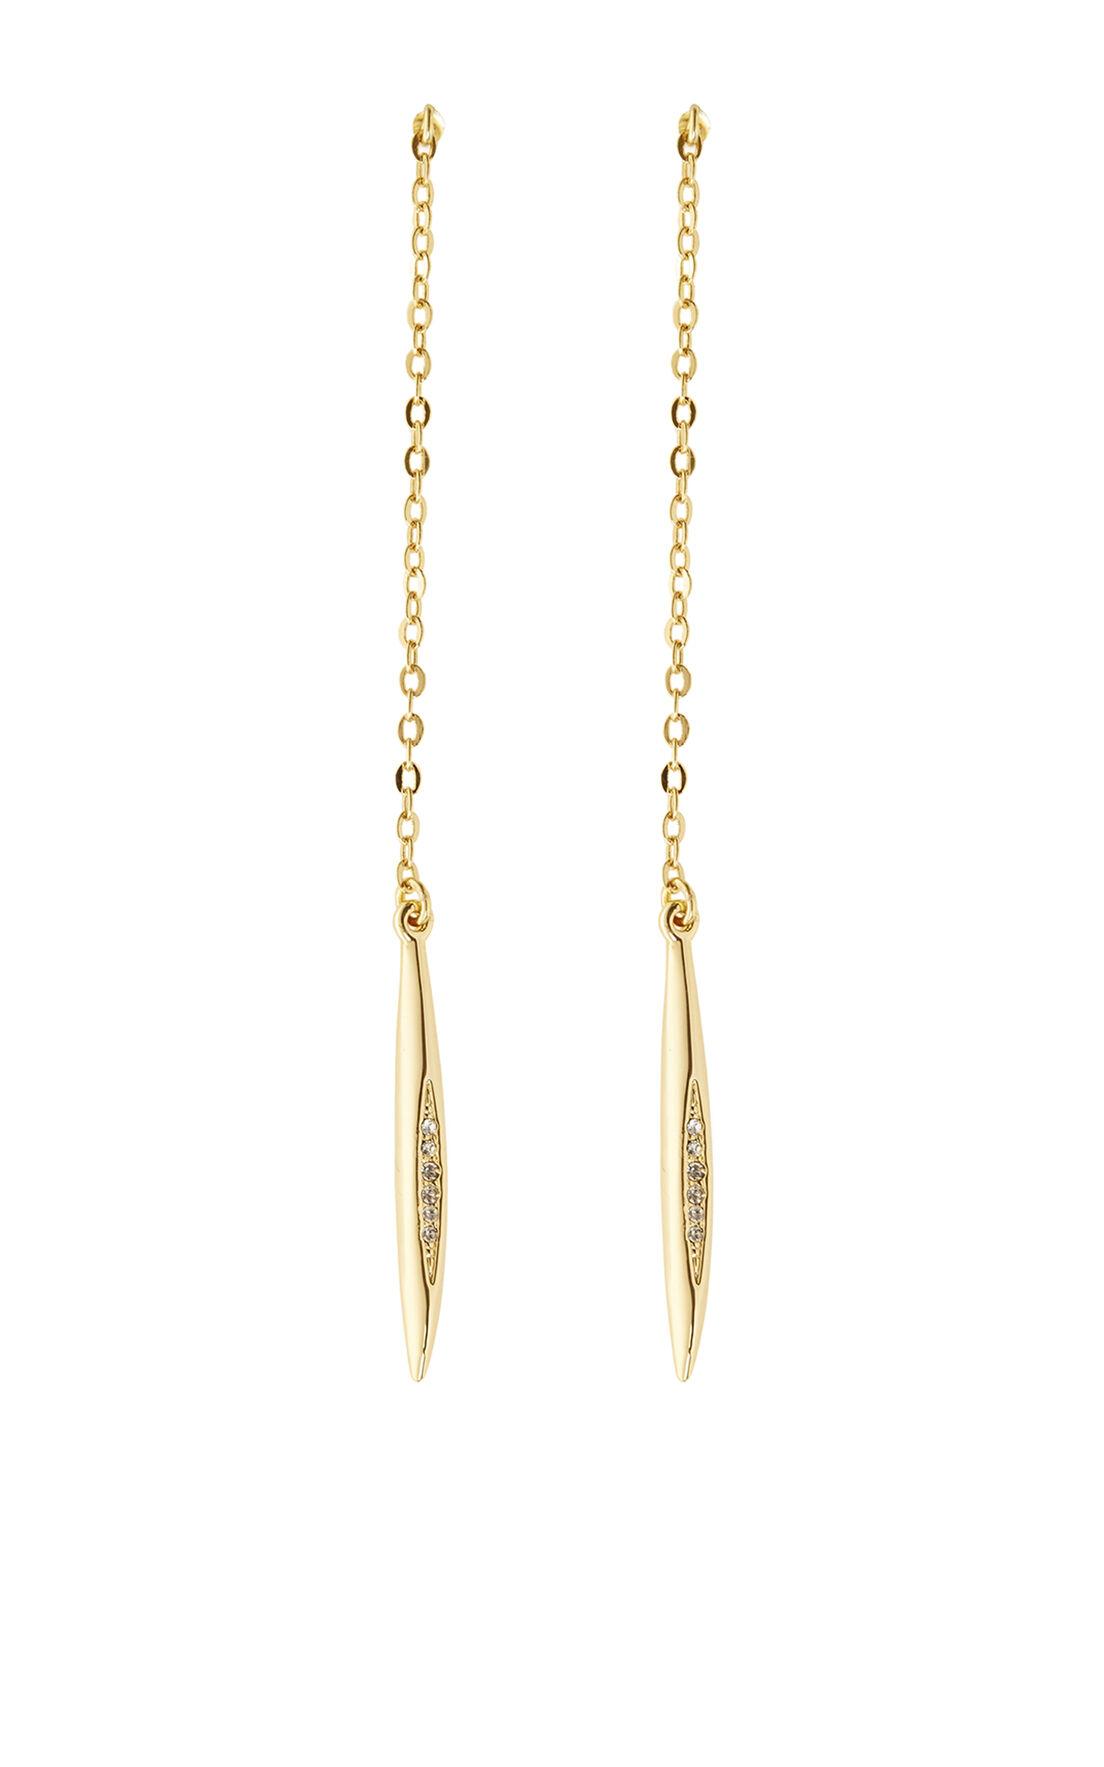 Karen Millen, CRYSTAL CHAIN EARRINGS Gold Colour 0